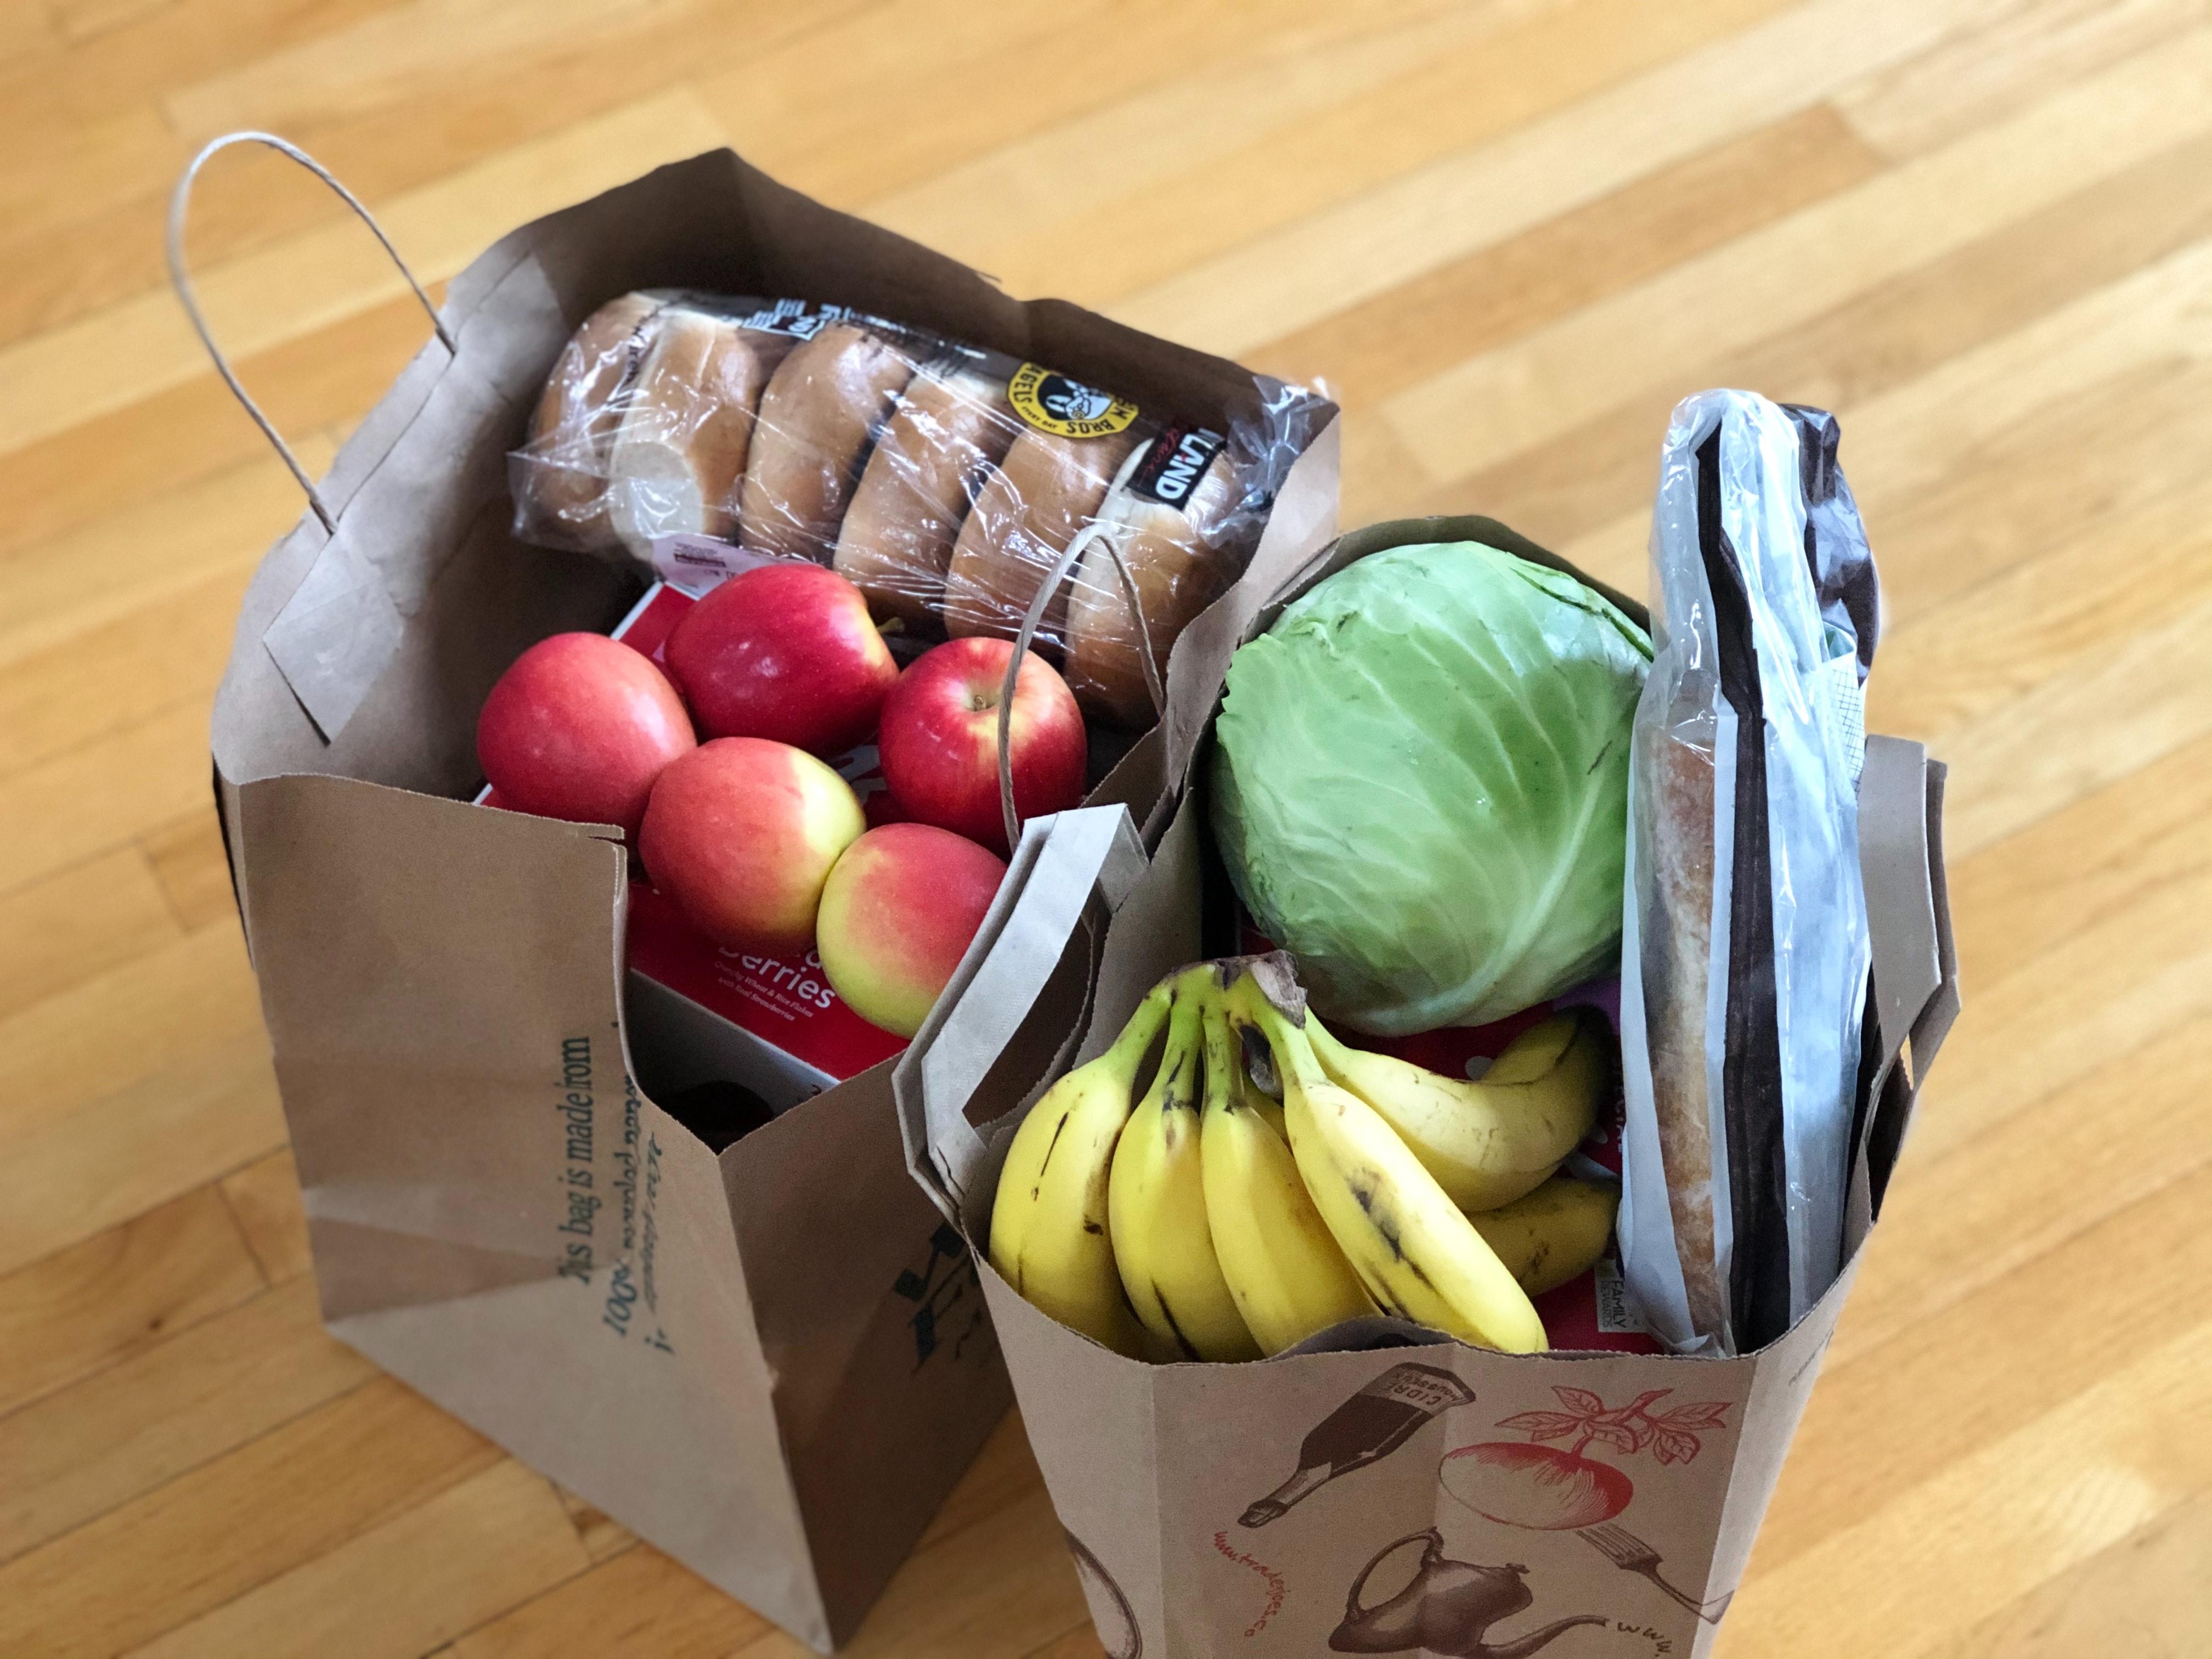 Bags of groceries